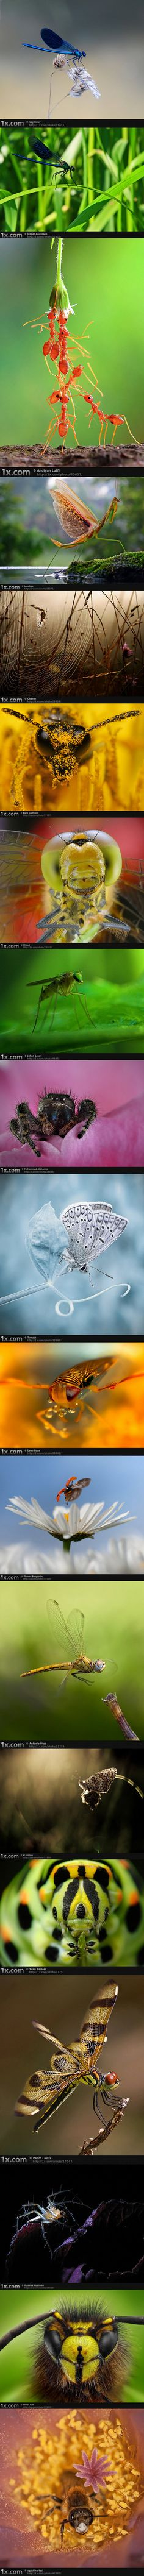 Love Macro pics!